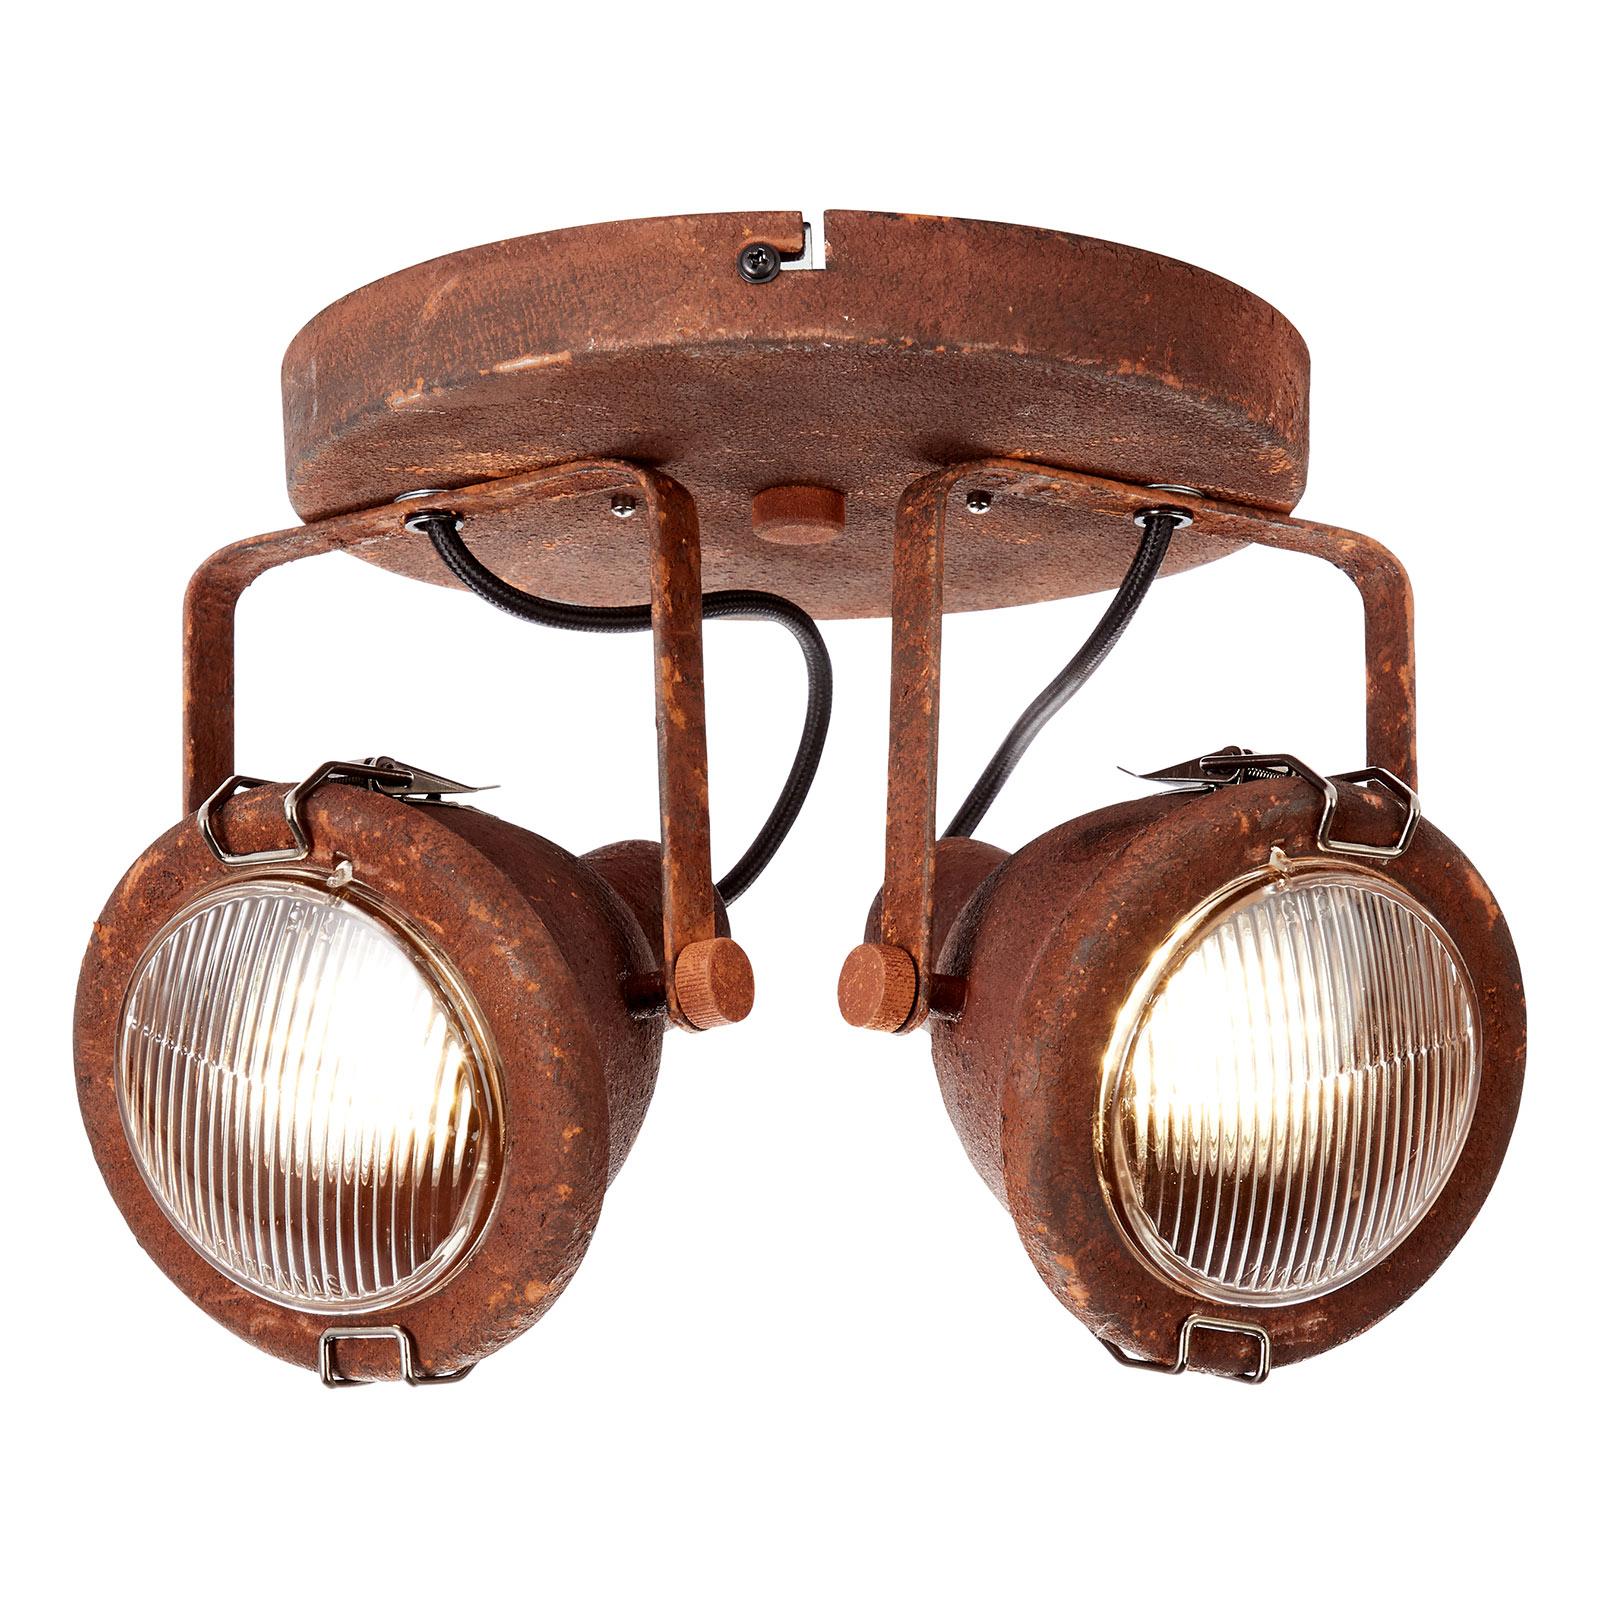 Modna industrialna lampa sufitowa Bentli 2-pkt.